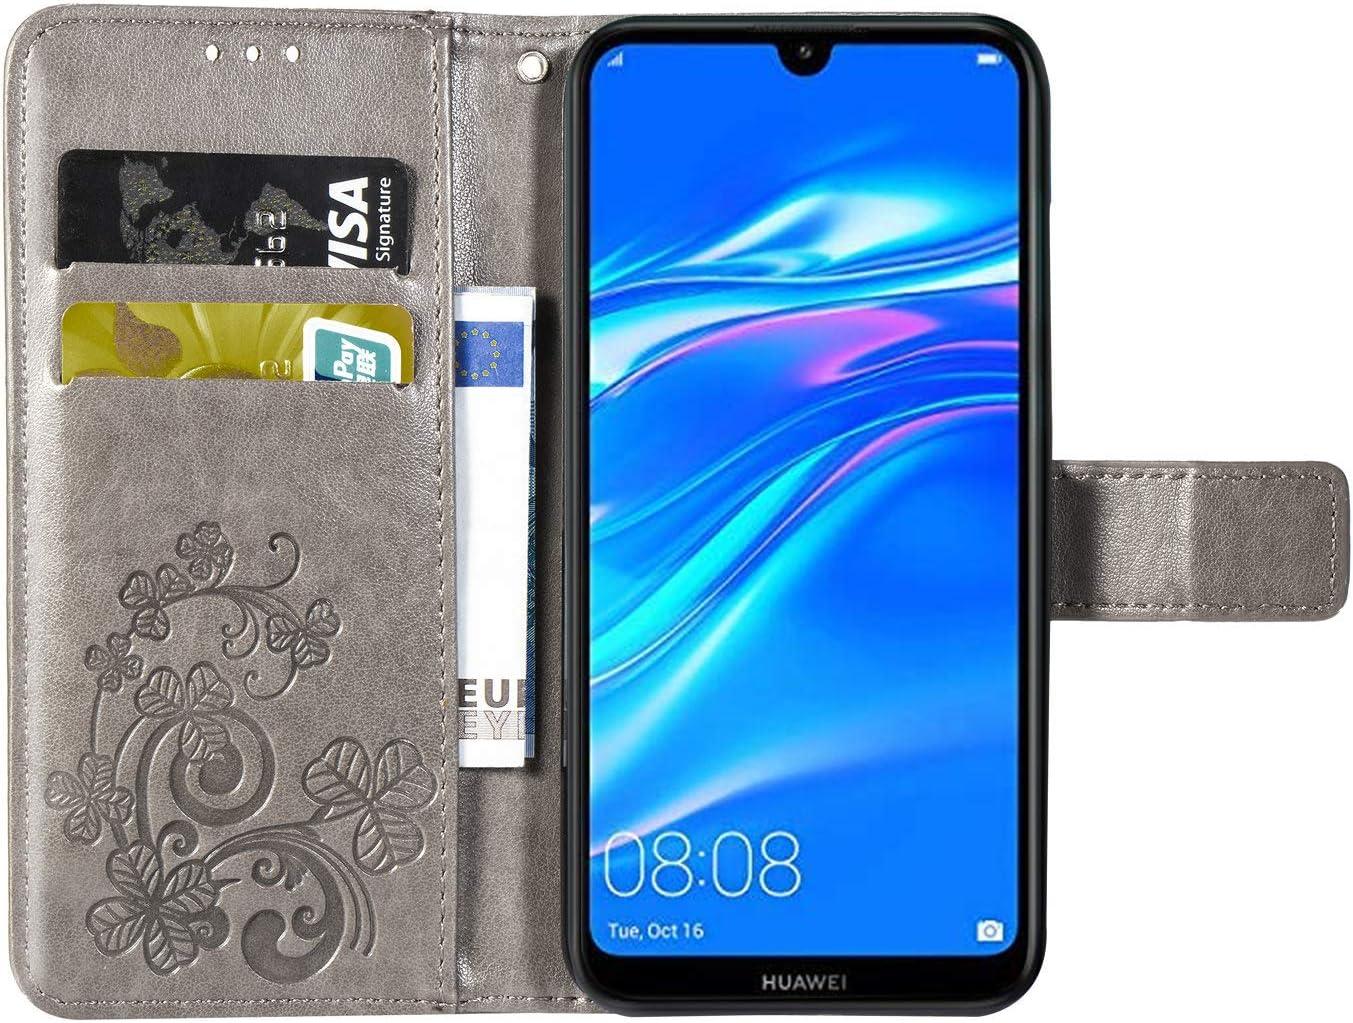 Protections Tosim Coque Huawei Y7 2019/Y7 Pro 2019 TOSDA040885 ...